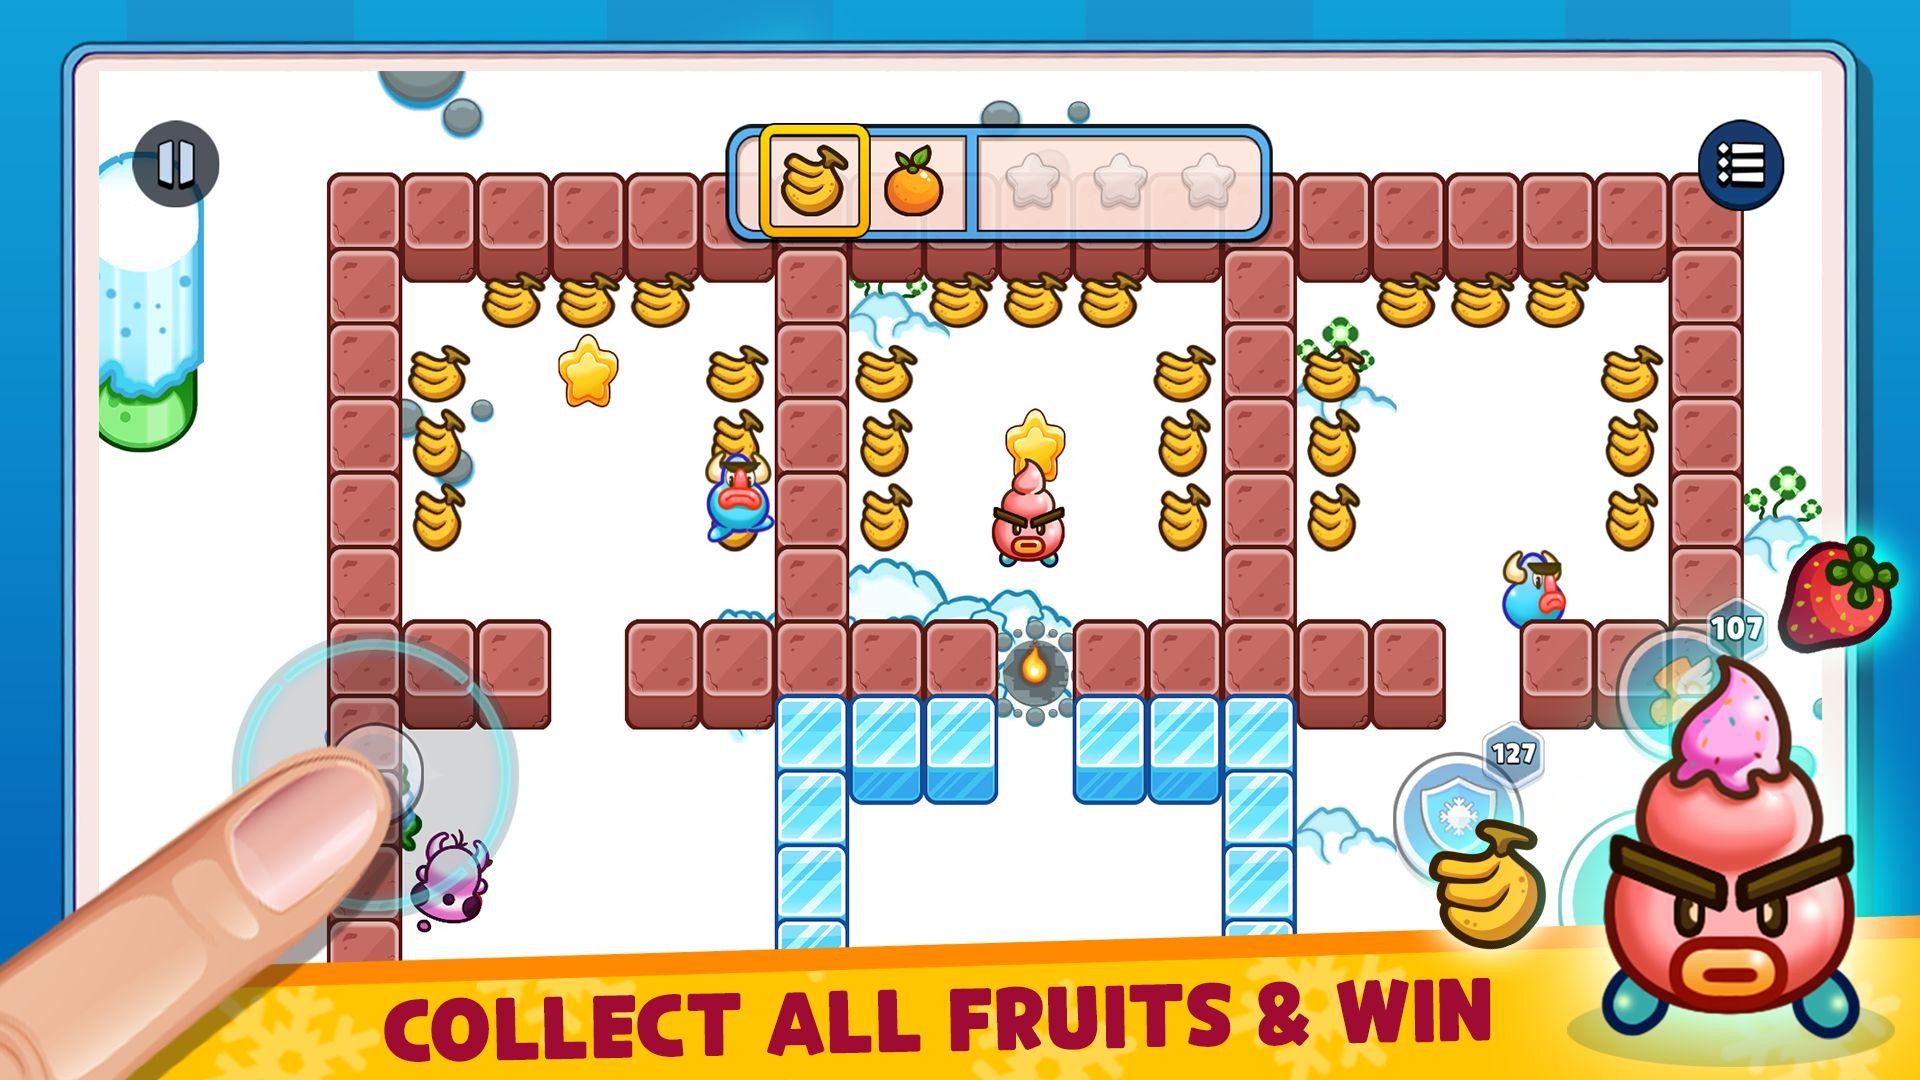 Fruit Ice Cream 2 - Ice cream war Maze Game скріншот 1